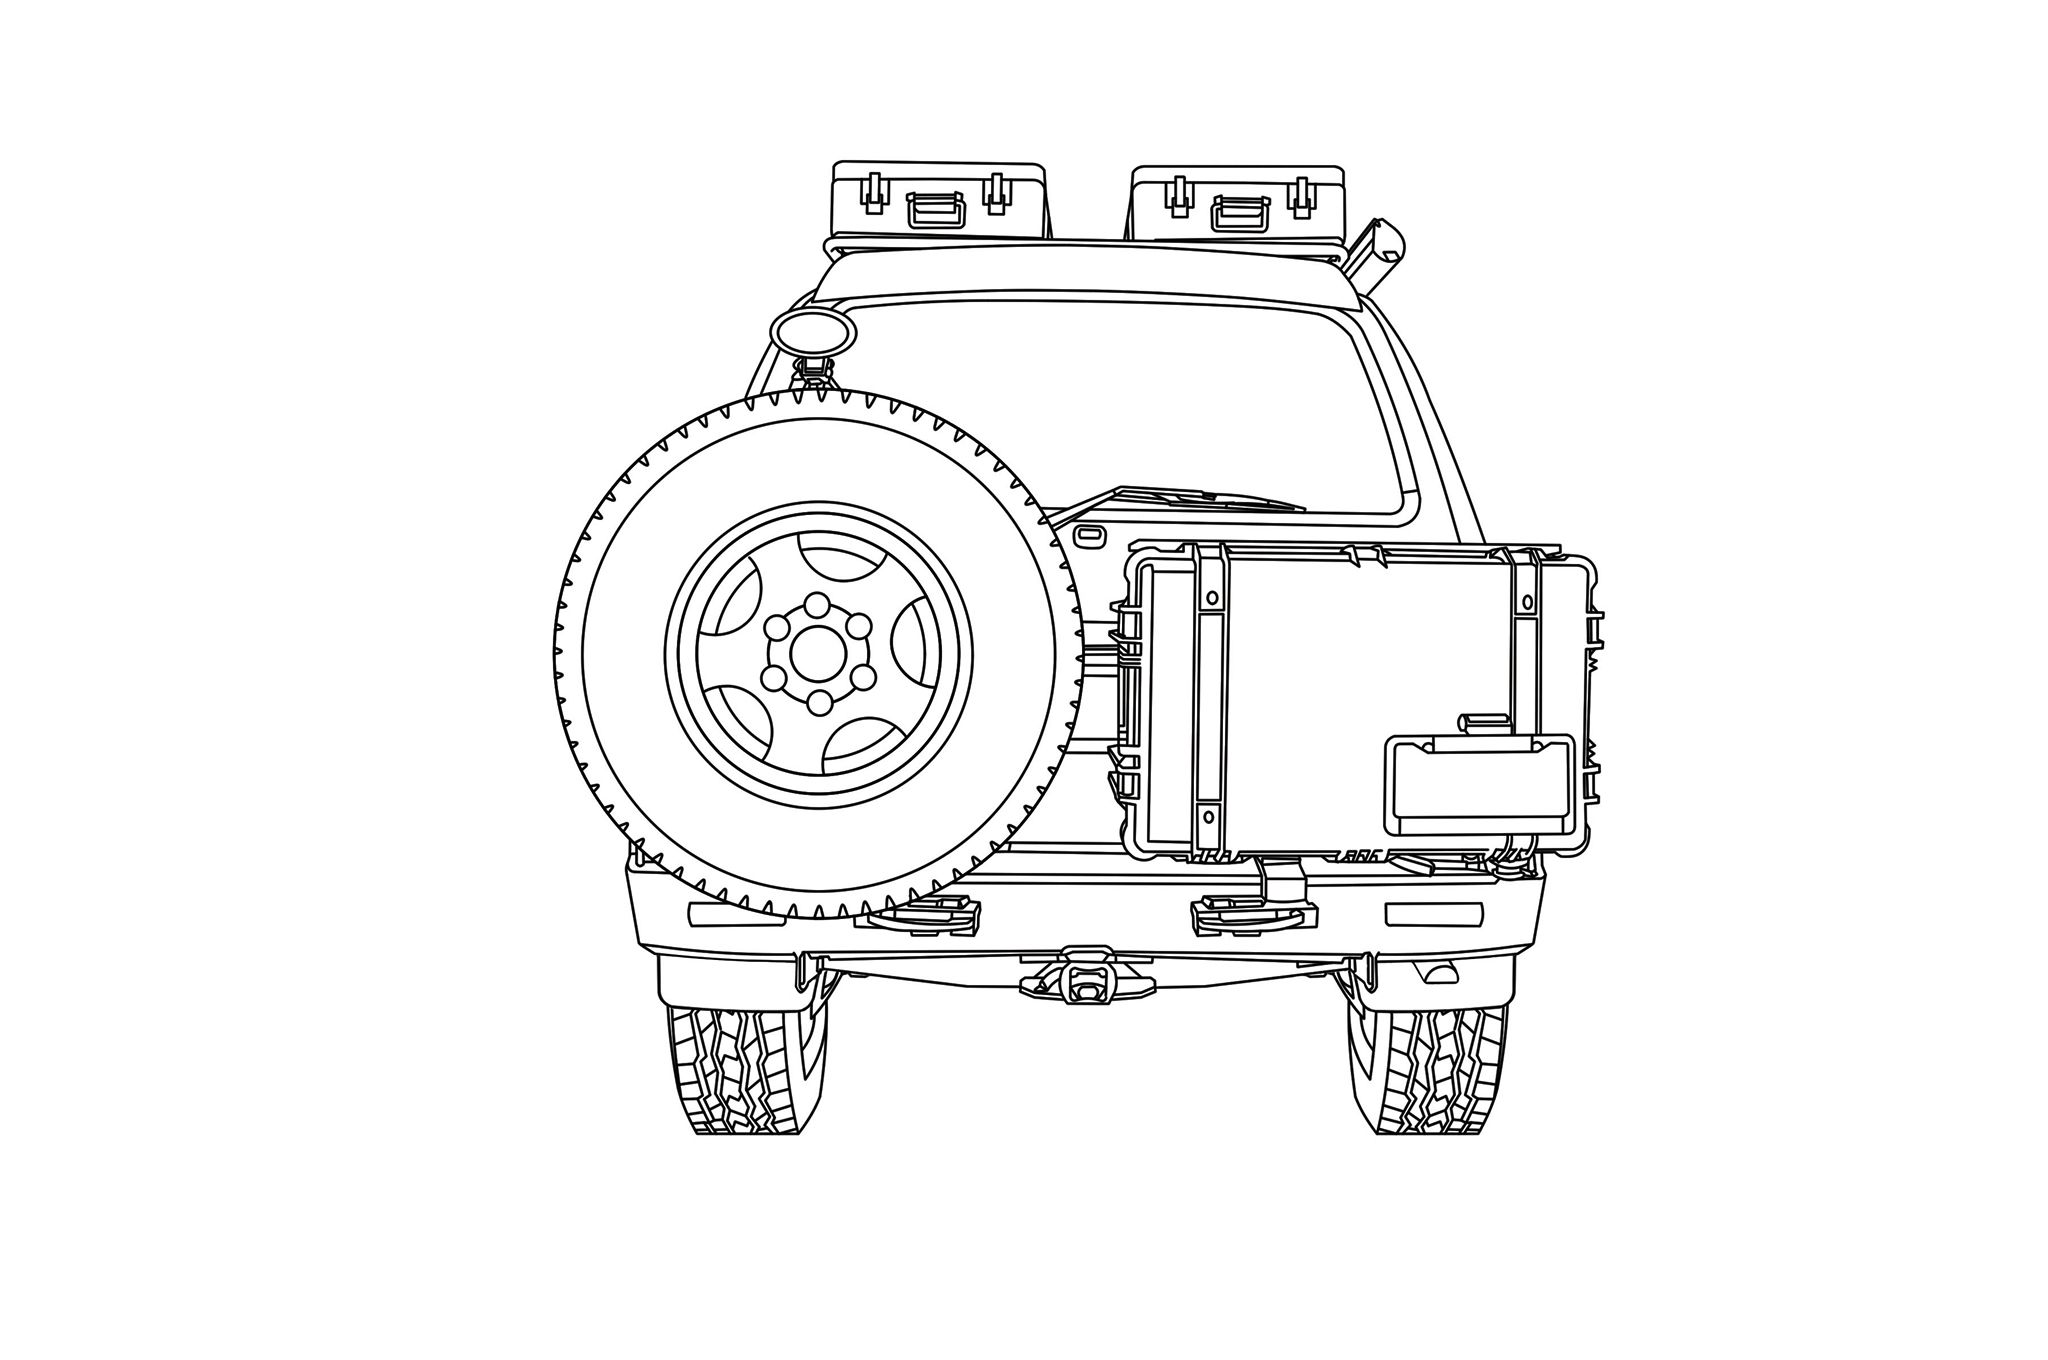 Toyota Land Cruiser Diagram Rear